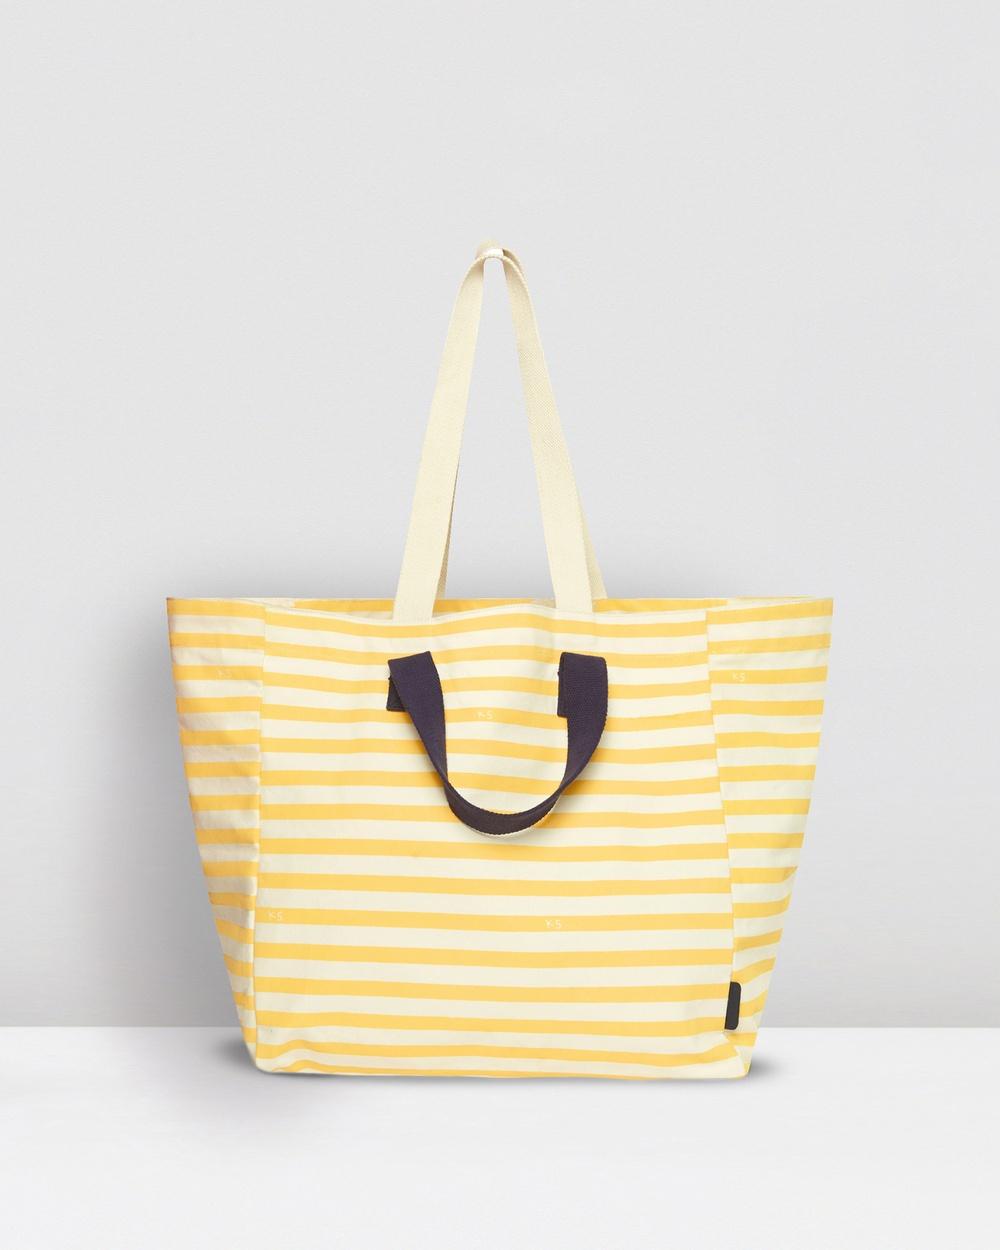 KID STOCK Big Bag Outdoors Yellow